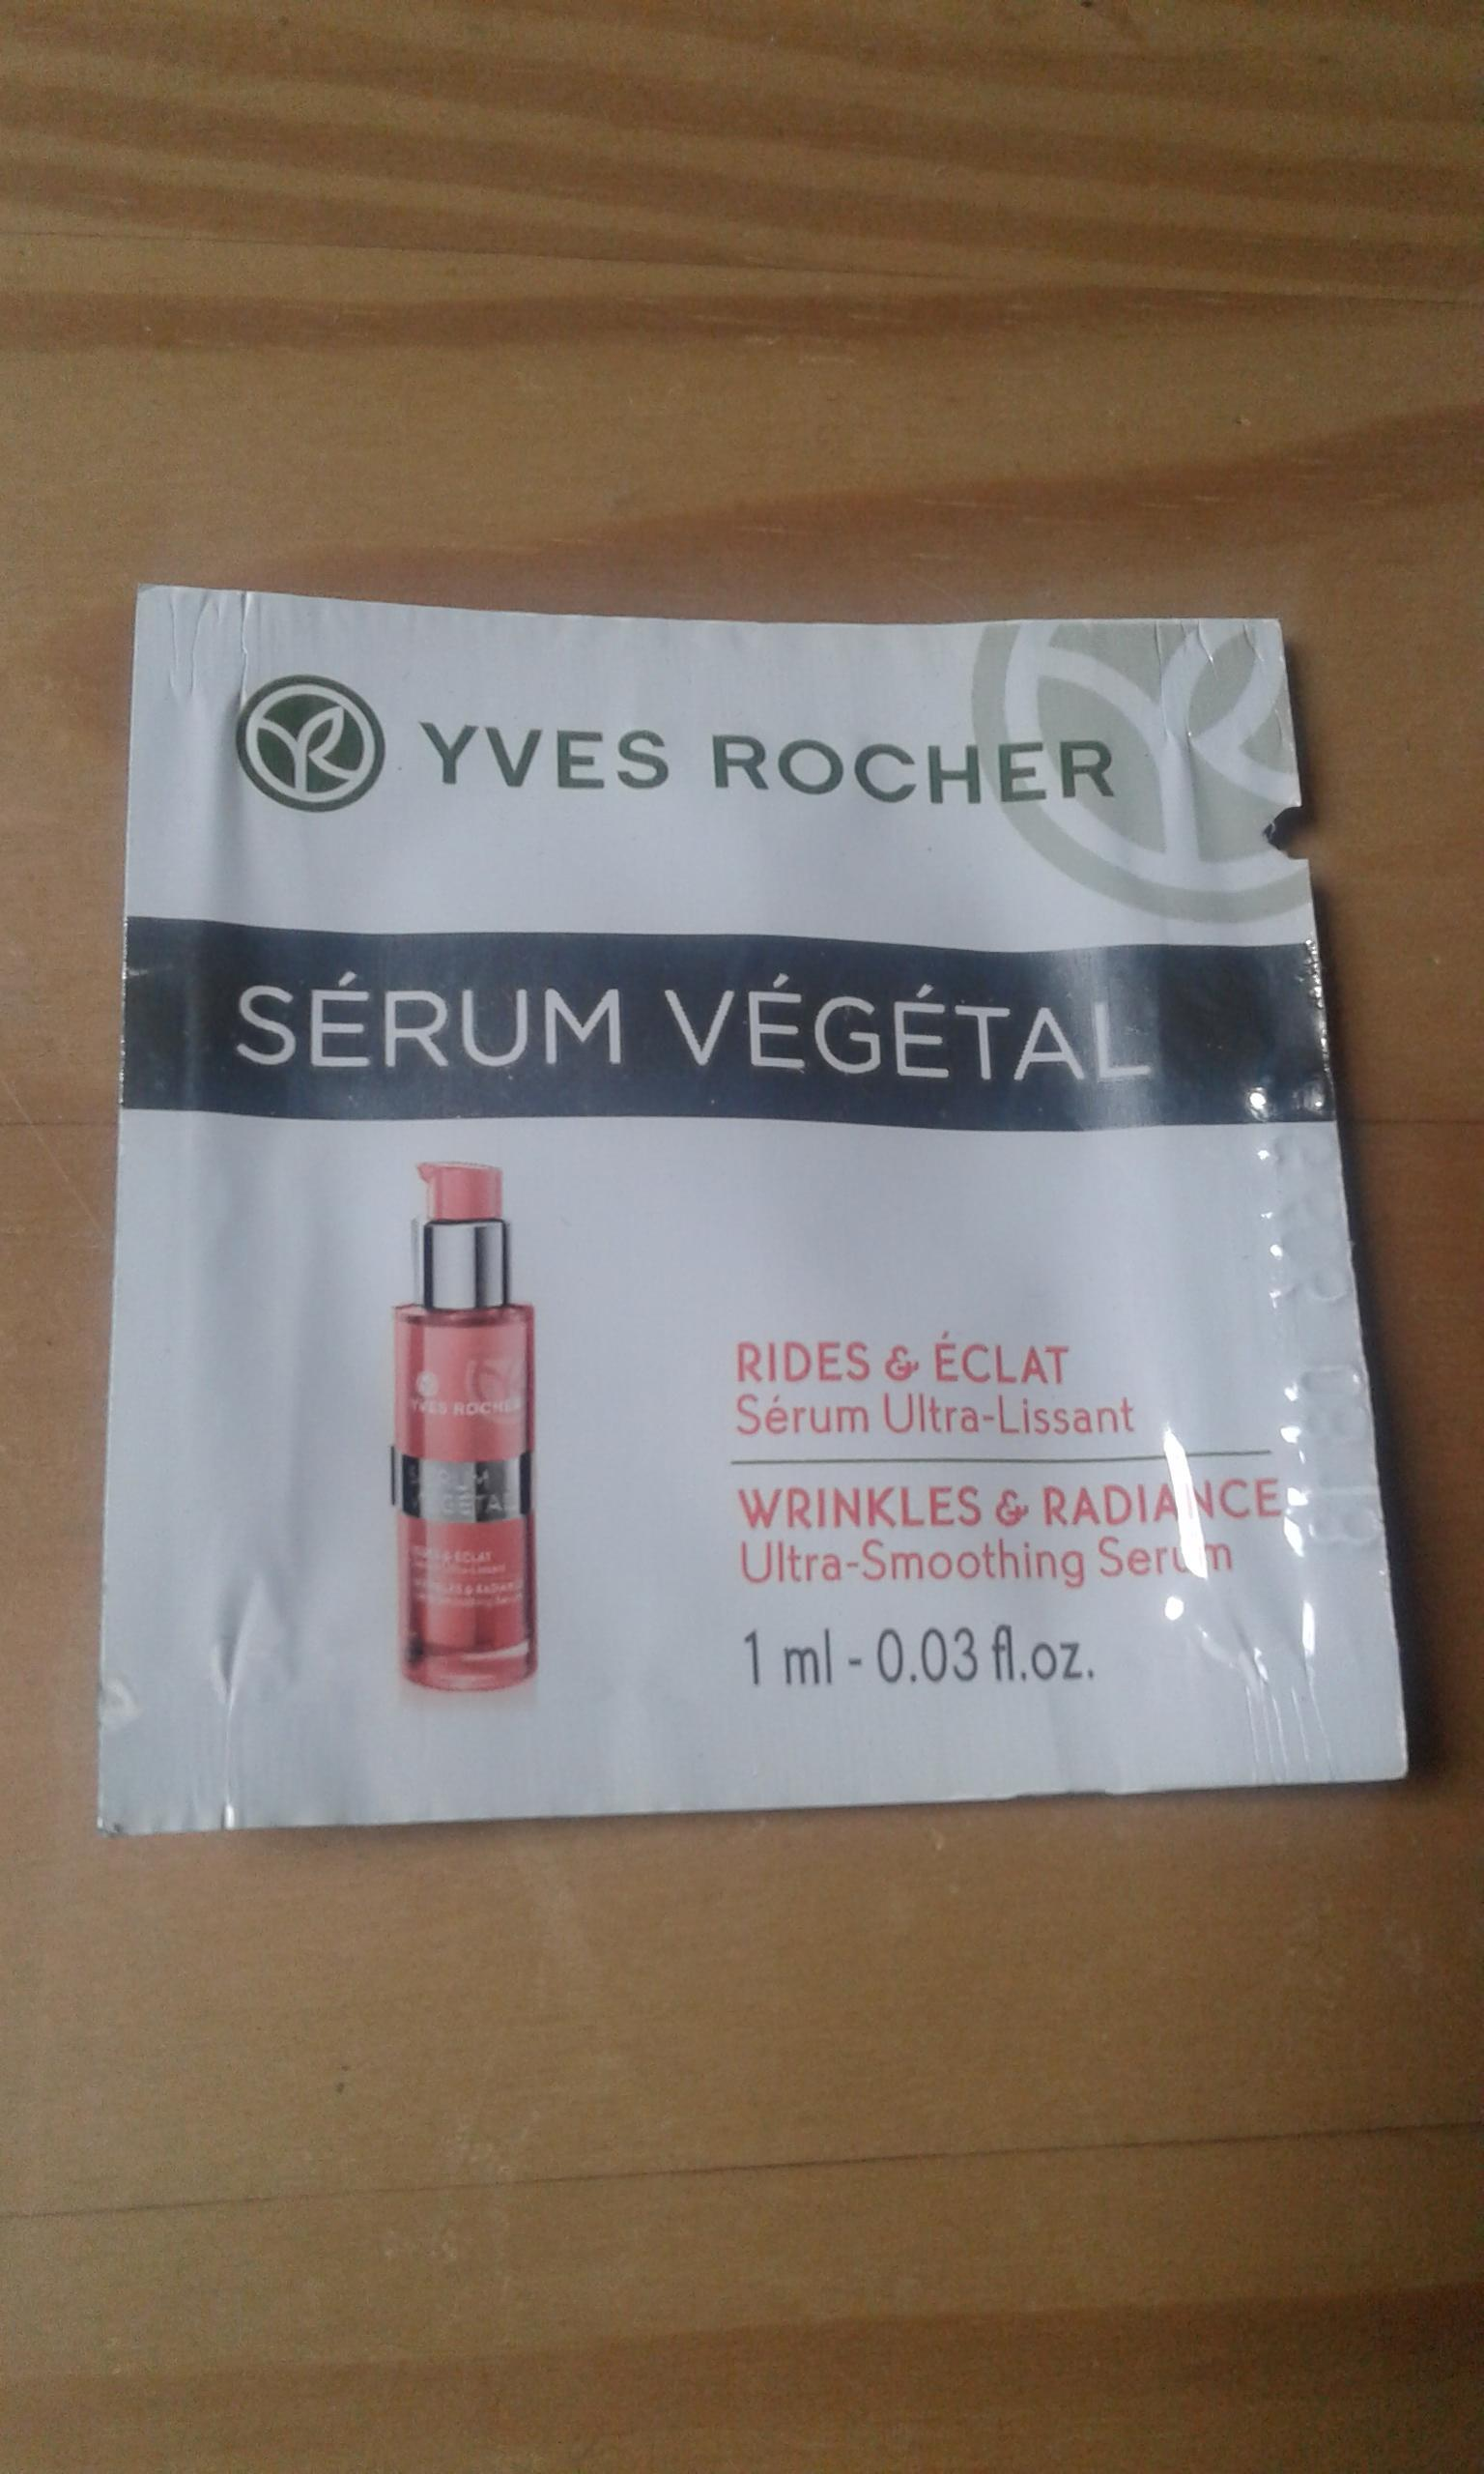 troc de troc res n - echantillon serum vegetal (2) image 0